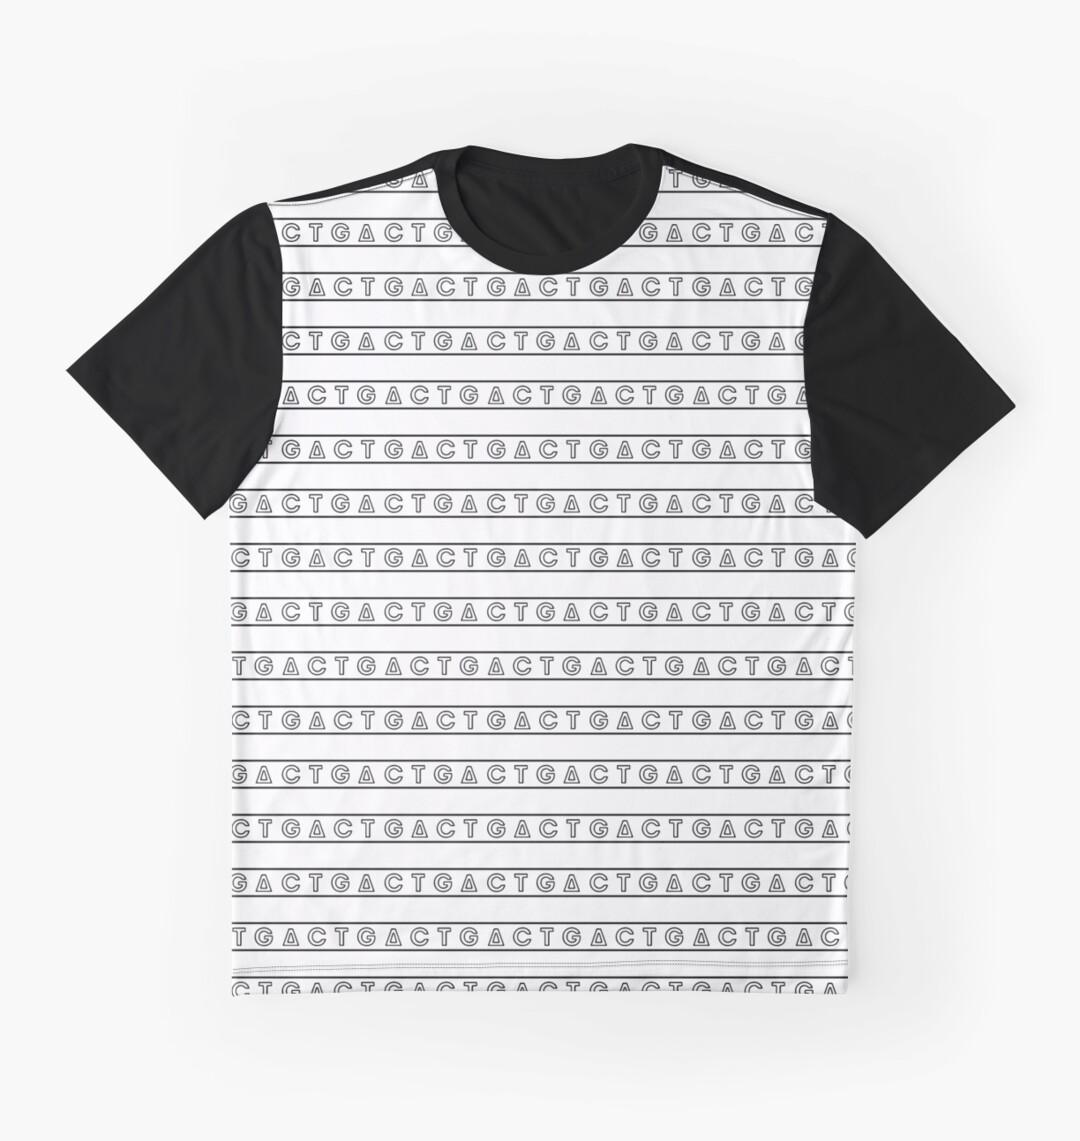 T shirt whitesnake - White Snake Jojo S Bizzare Adventure Graphic T Shirts